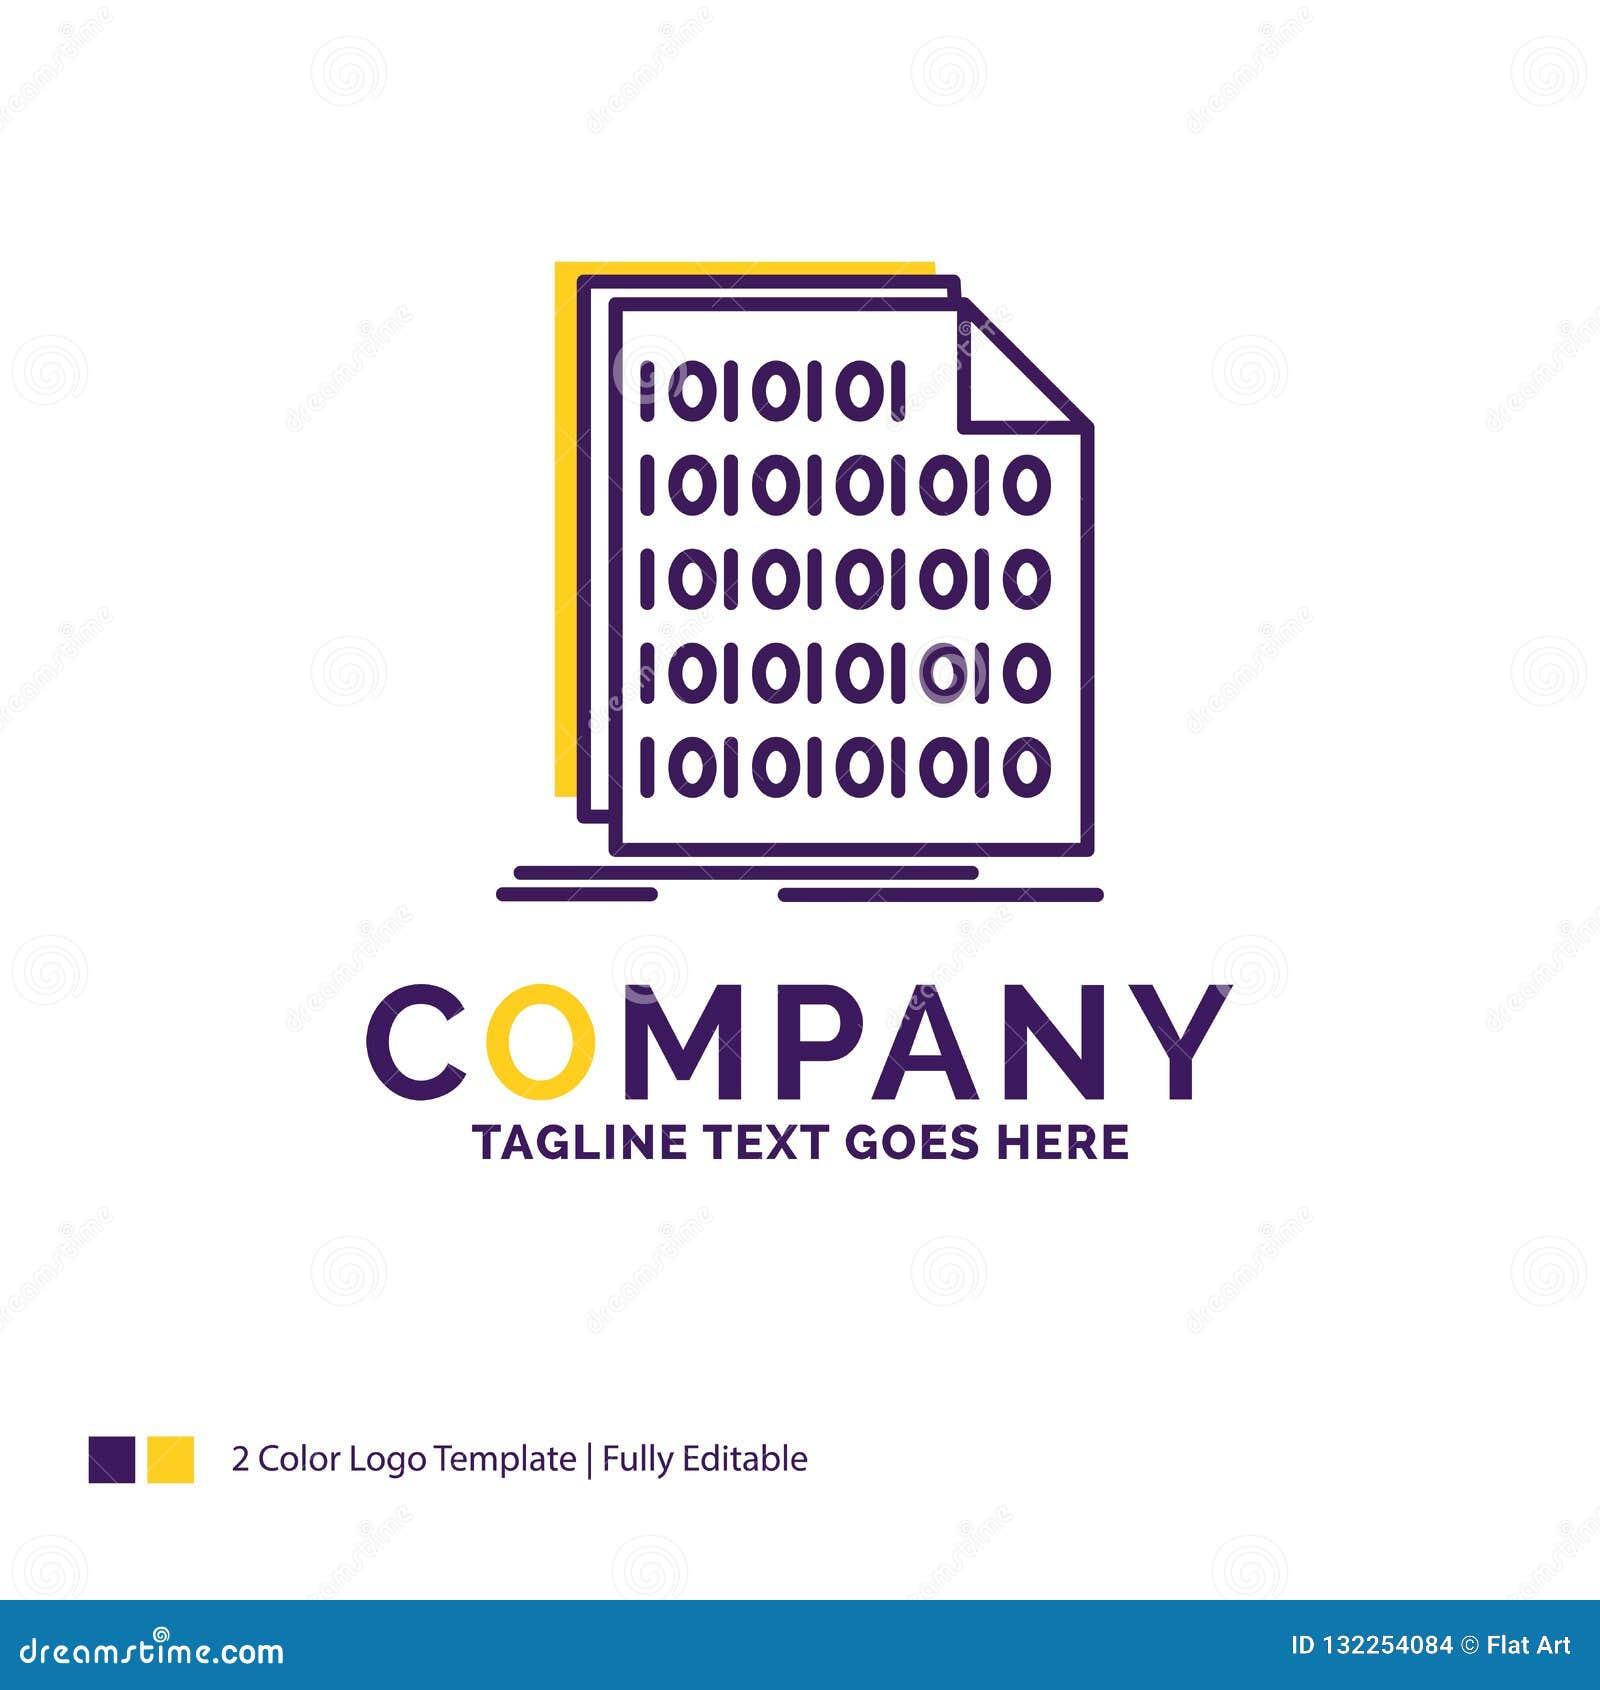 Company Name Logo Design For Binary, code, coding, data, documen